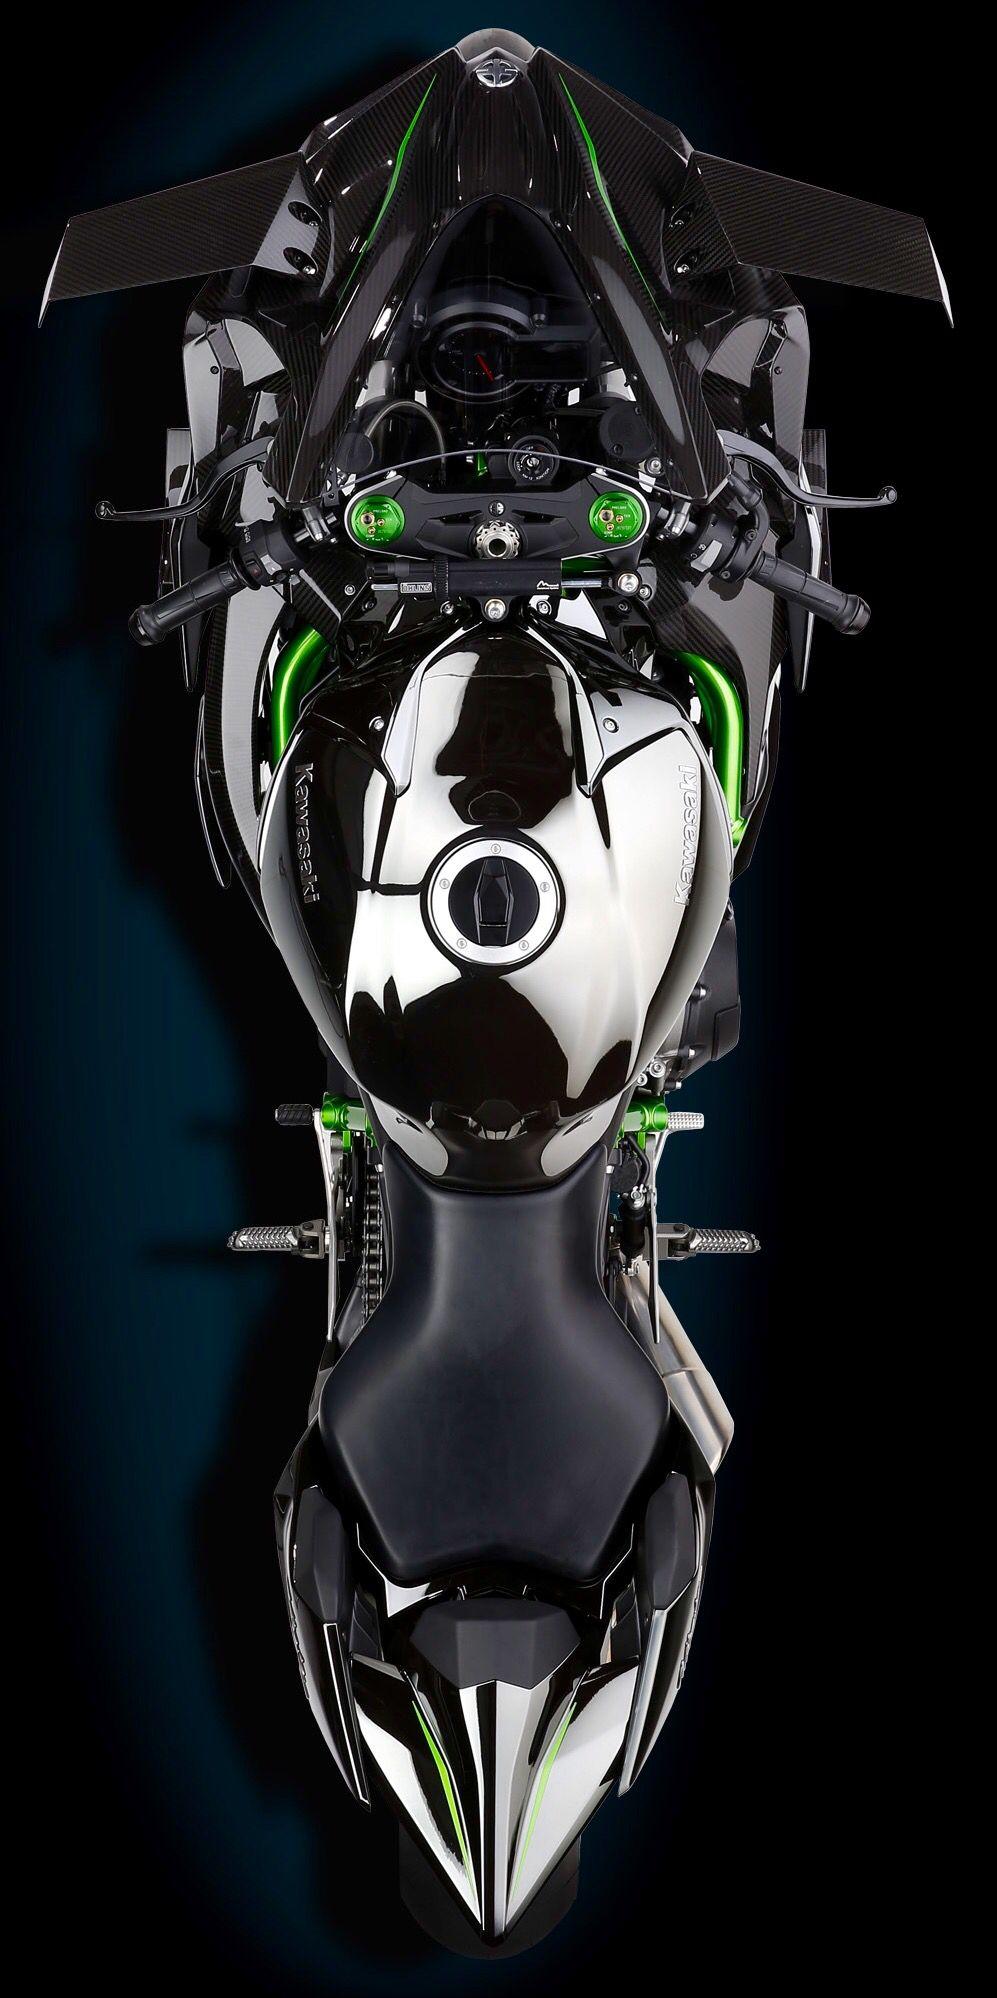 Kawasaki Ninja H2r Supercharged Track Bike Ninja Bike Kawasaki Bikes Kawasaki Ninja